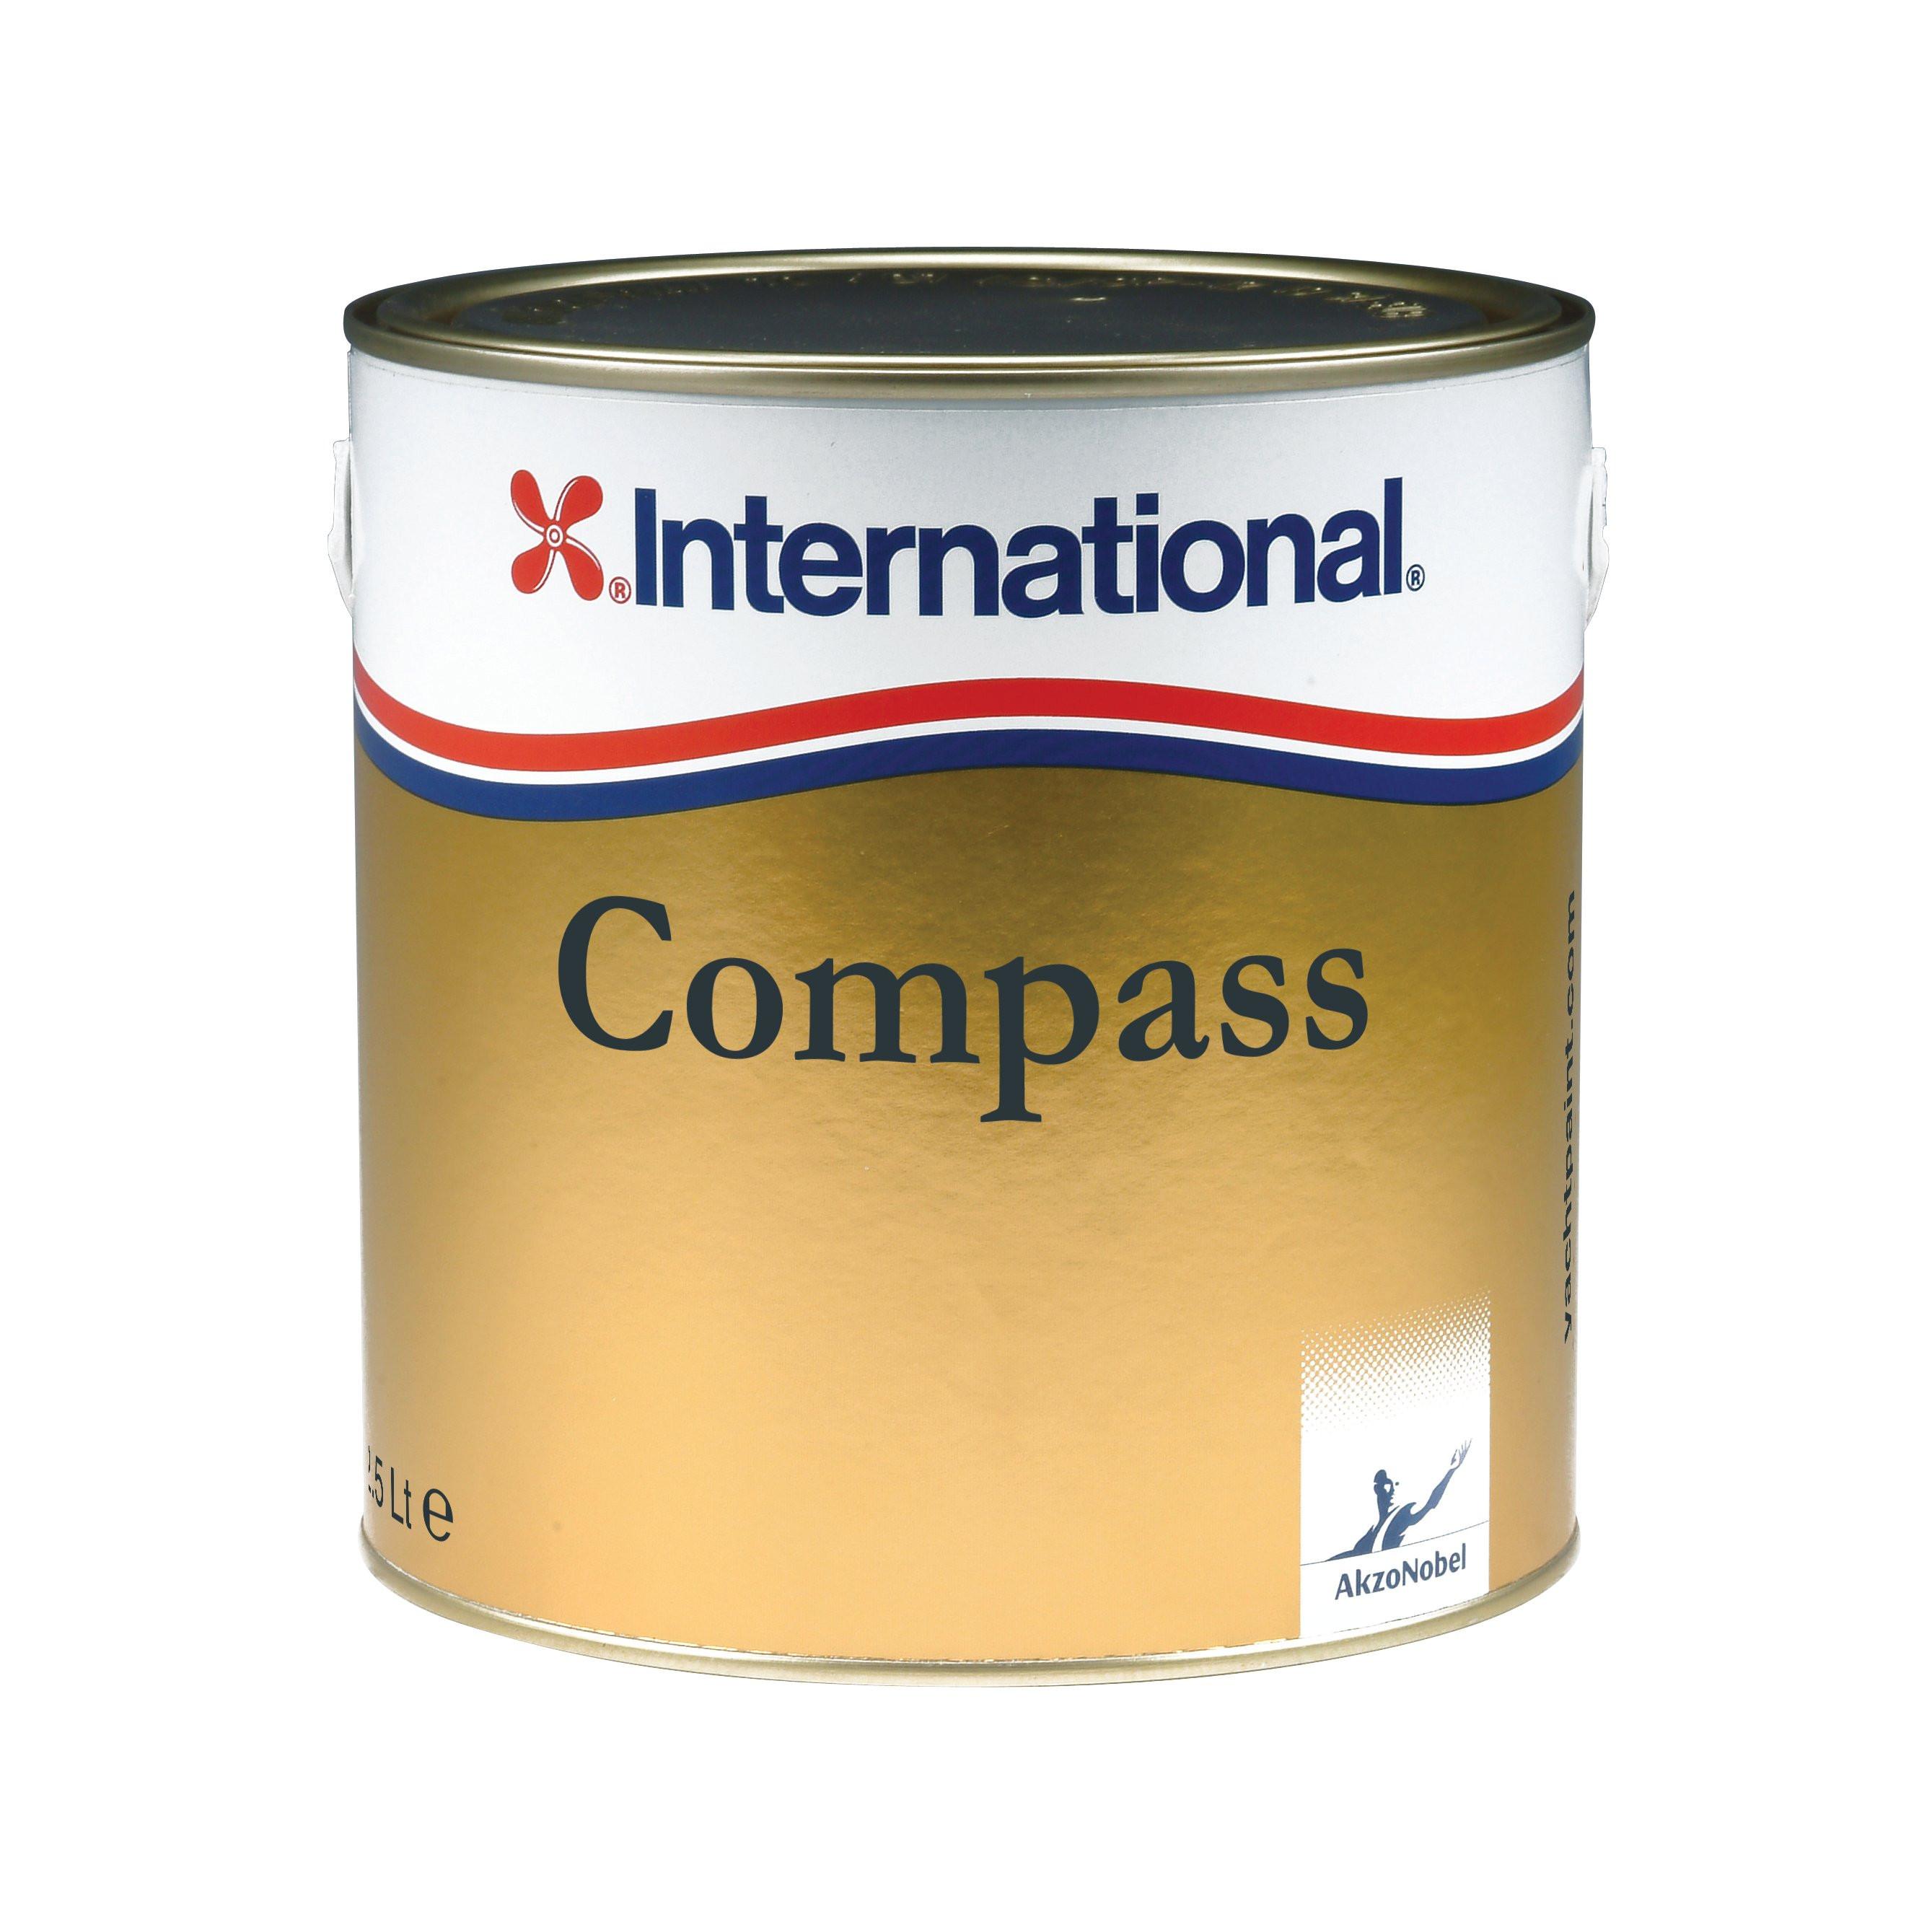 International Compass hoogglanzende vernis - 2500ml